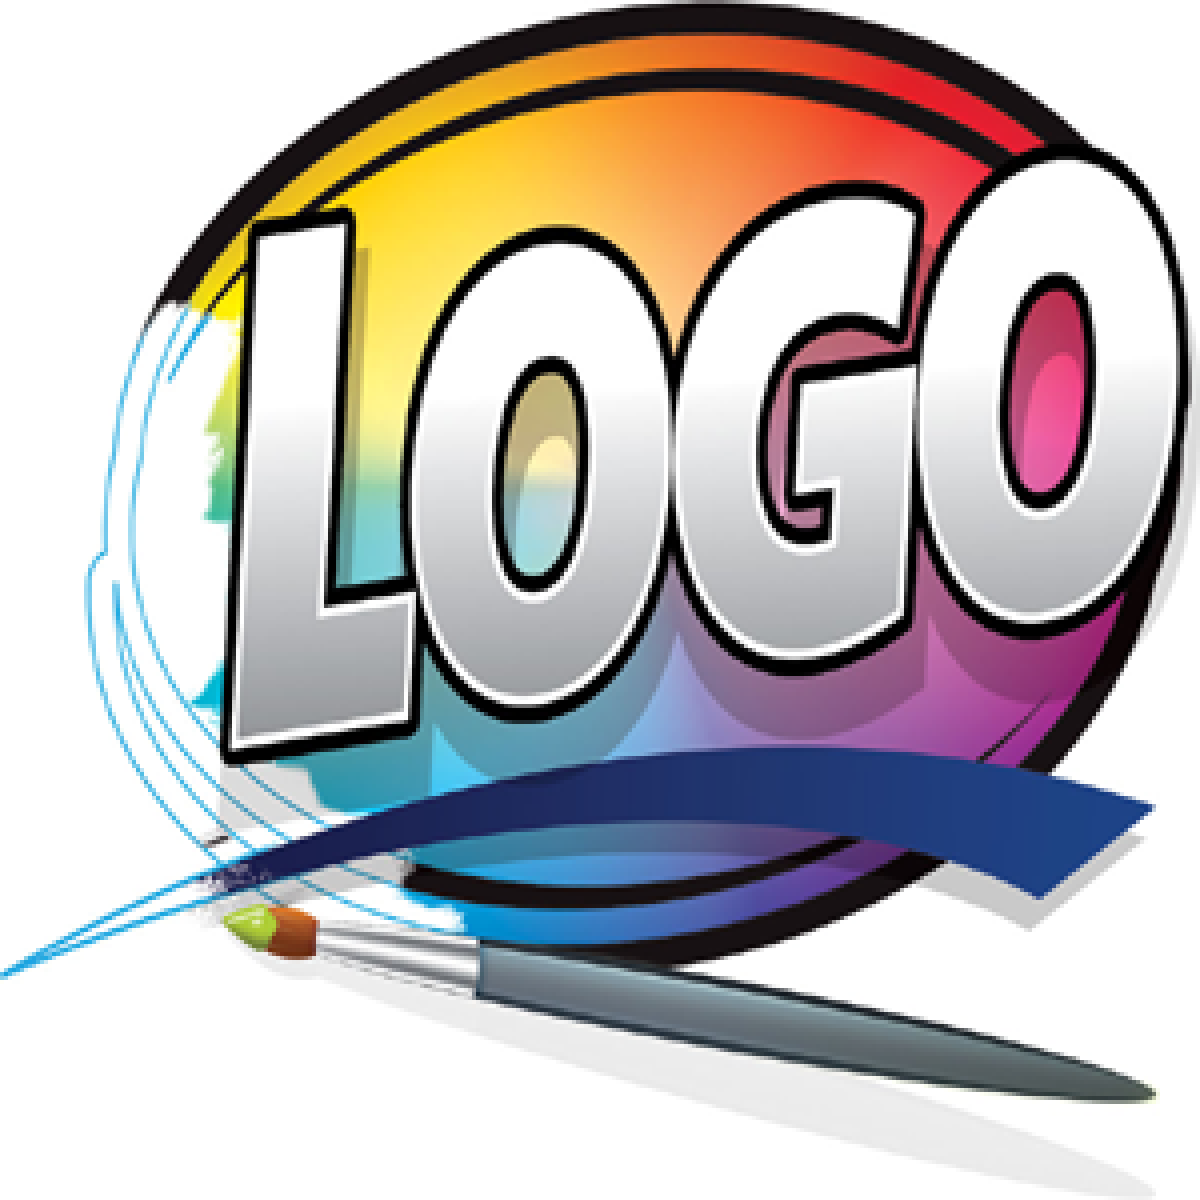 Summitsoft Logo Design Studio Pro 4 5 1 0 Crack Rar Melchiorre S Weblog